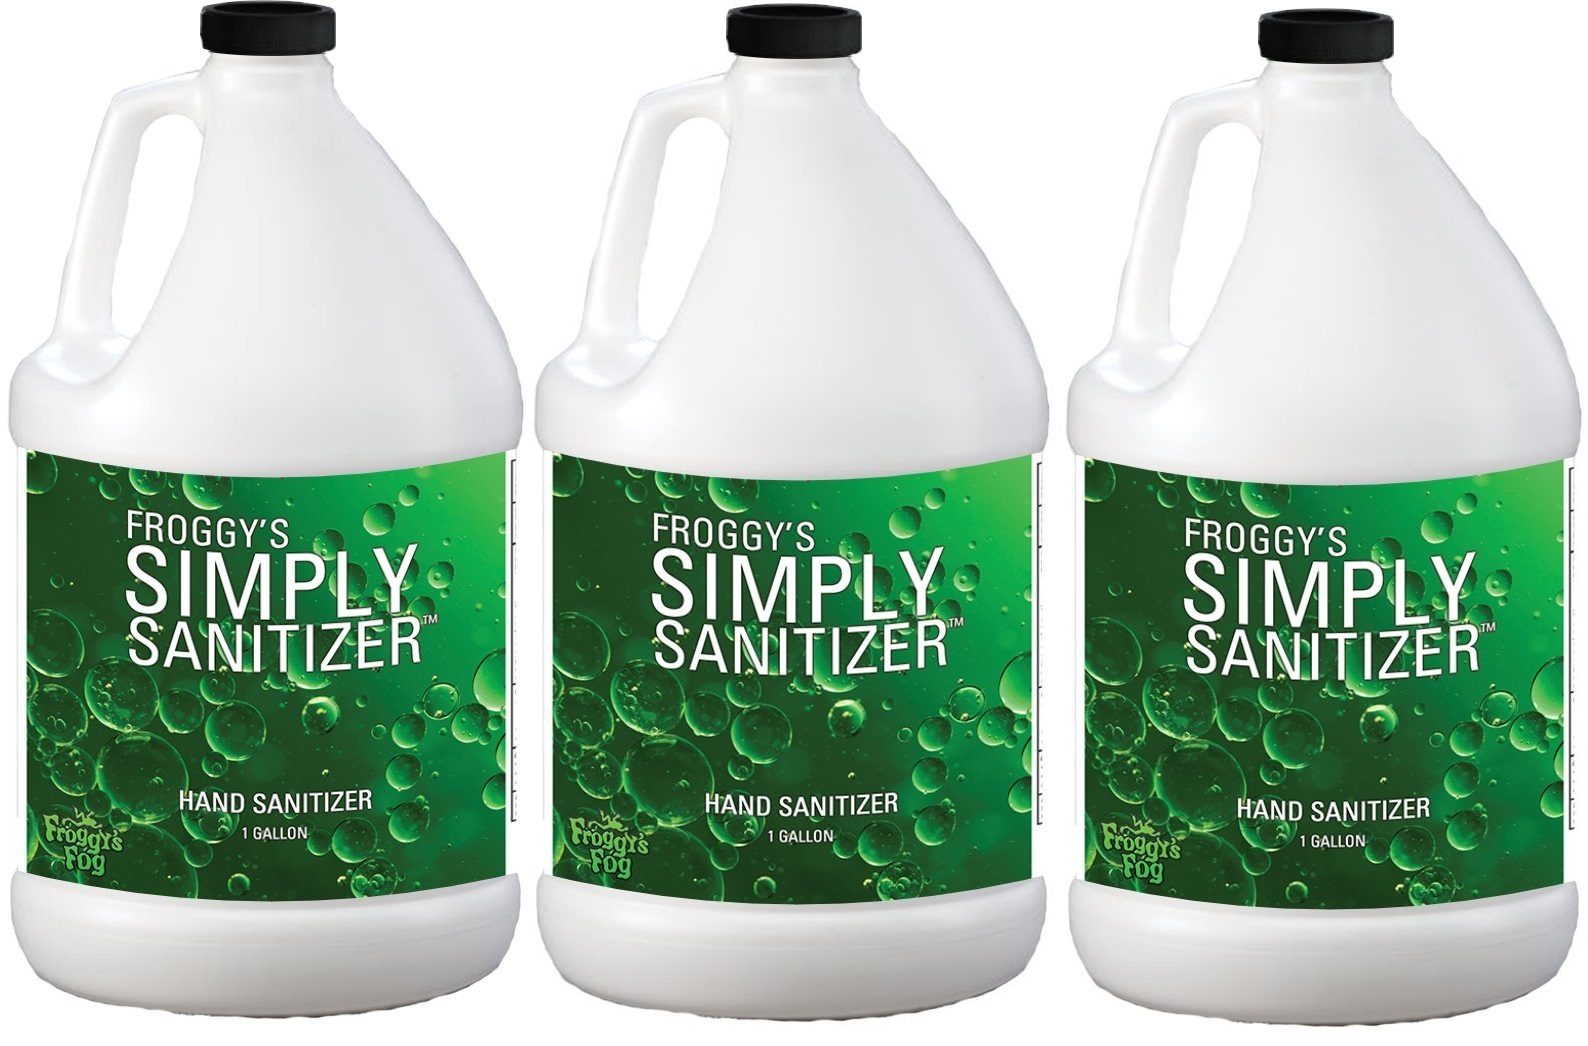 froggys-fog-simply-sanitize---hand-sanitizer-3-gallon.jpeg